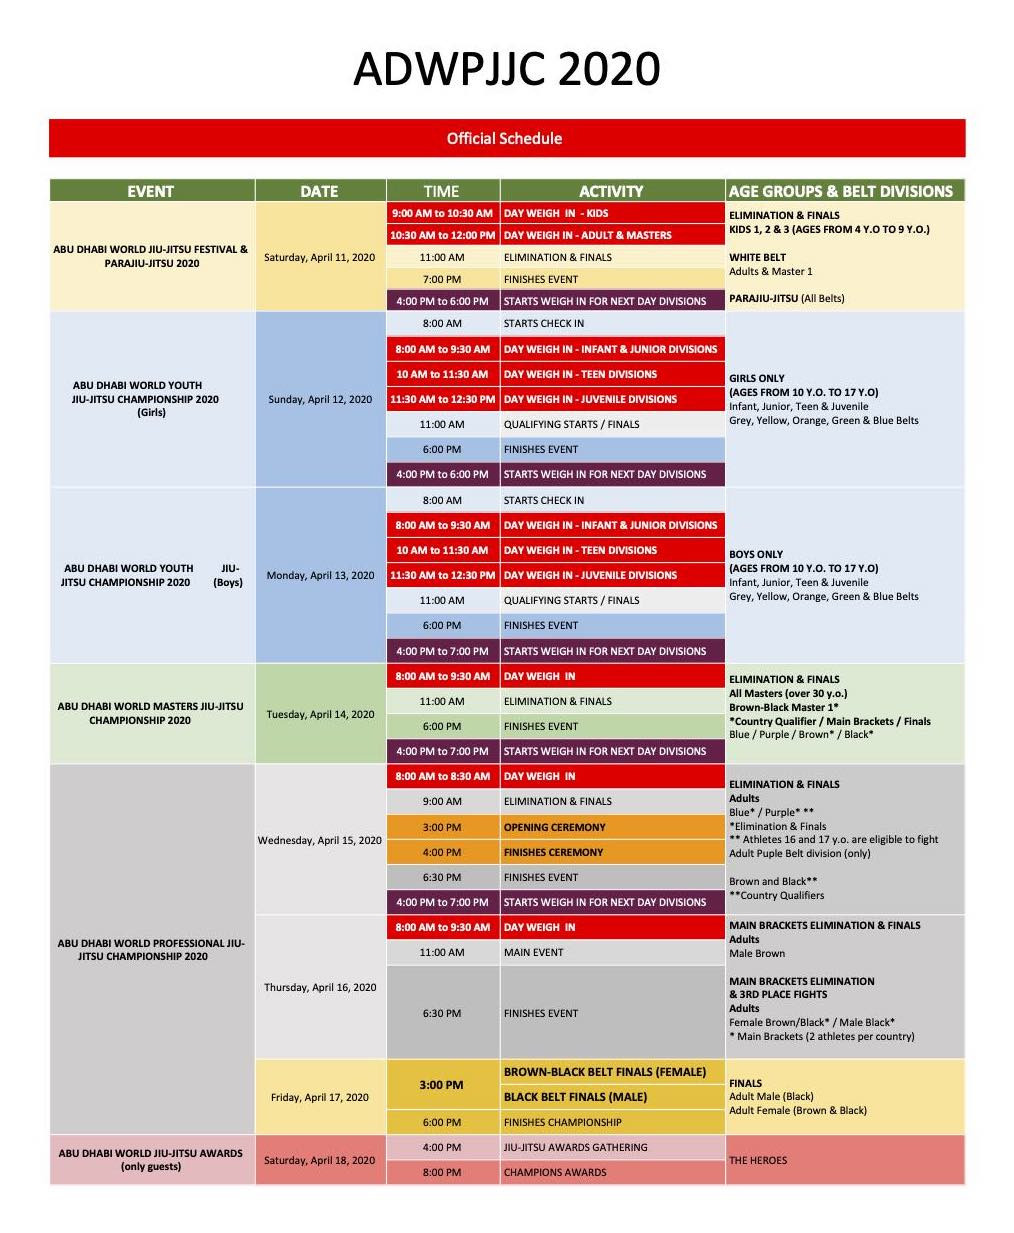 uae-jiu-jitsu-federation-offcial-schedule-2020-abu-dhabi-world-professional-jiu-jitsu-championship-20200206041129.jpeg